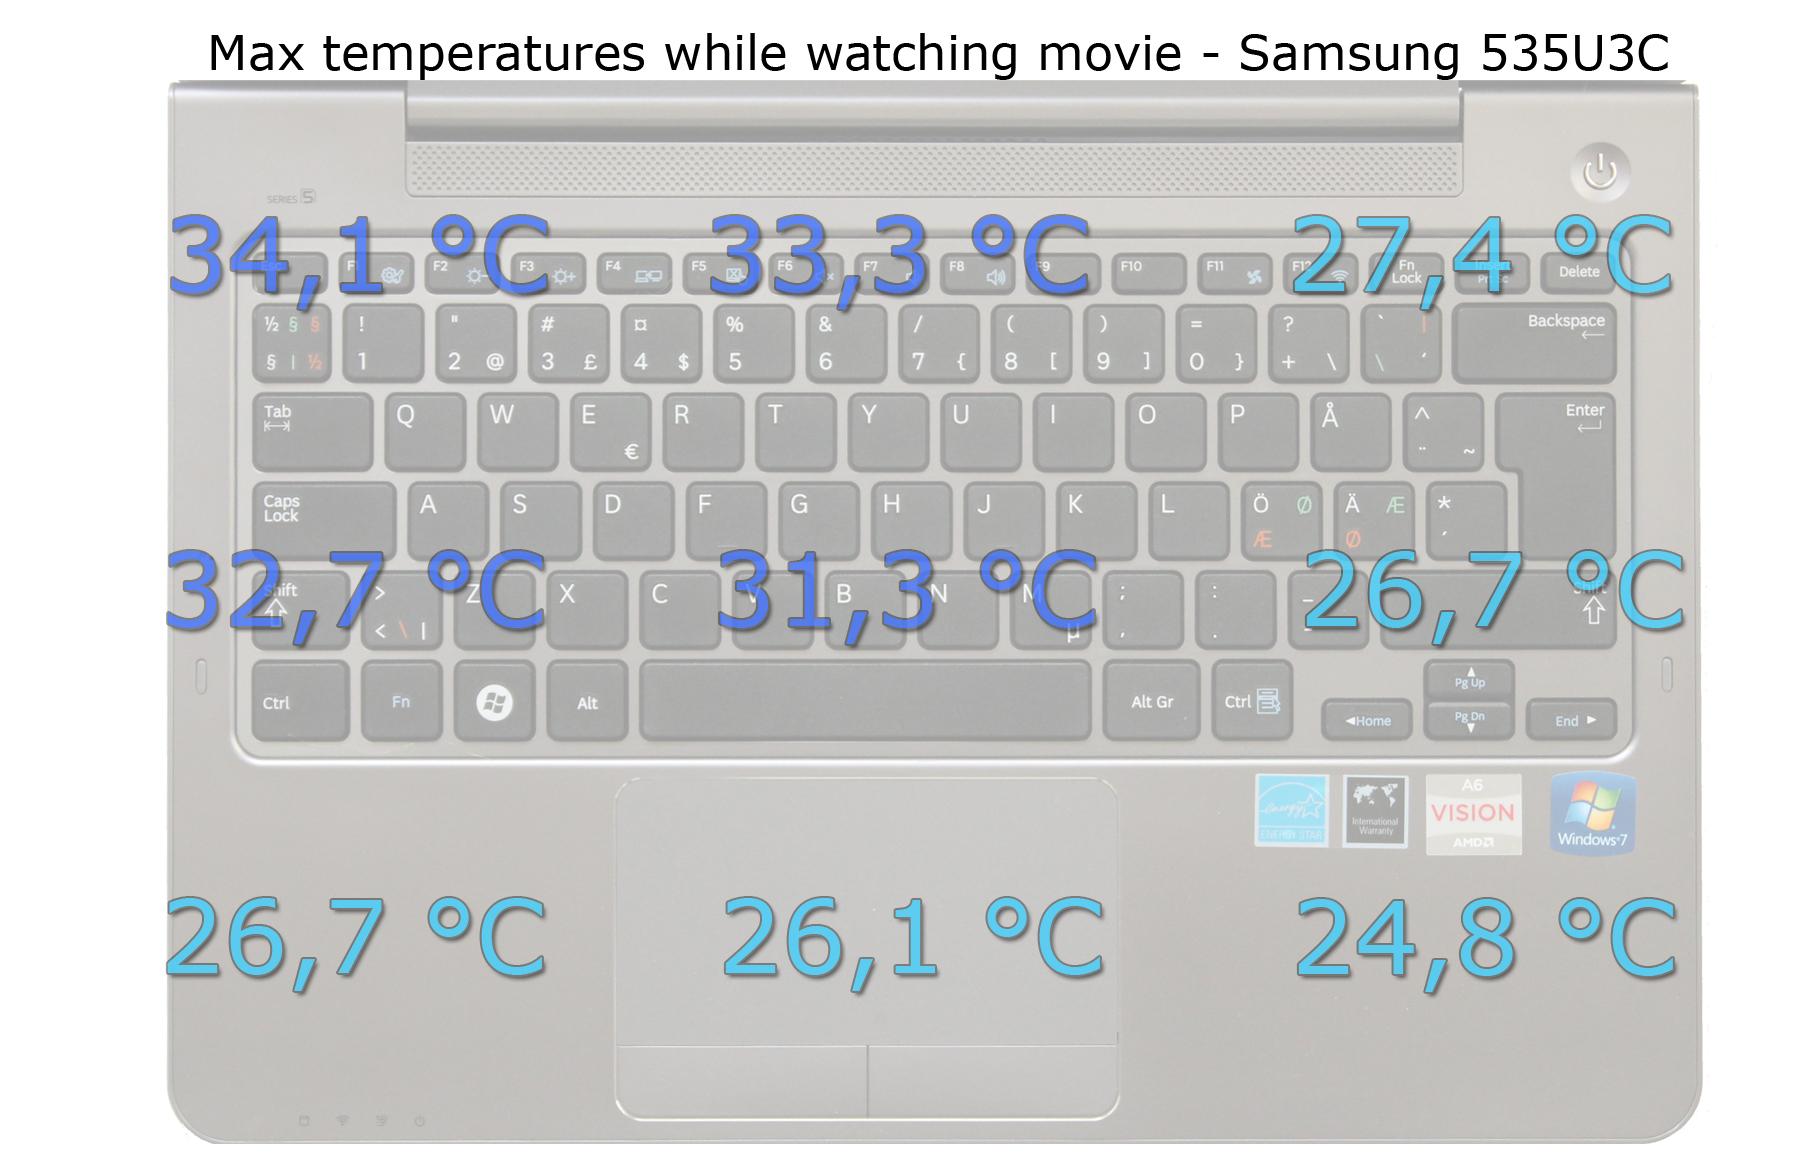 Samsung_535U3C_Temp1